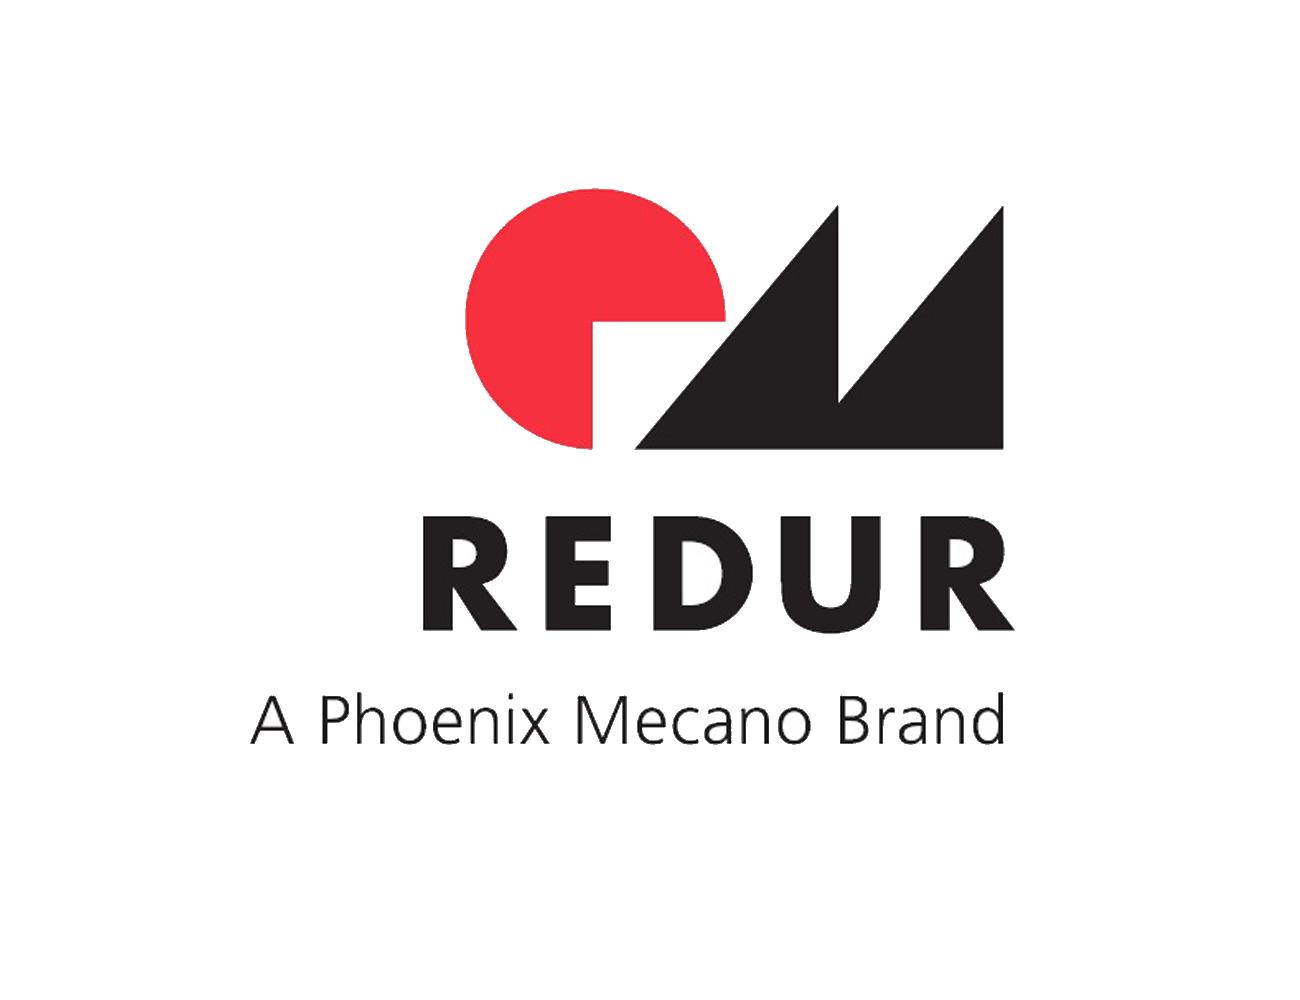 Redur (A Phoenix Mecano Brand)